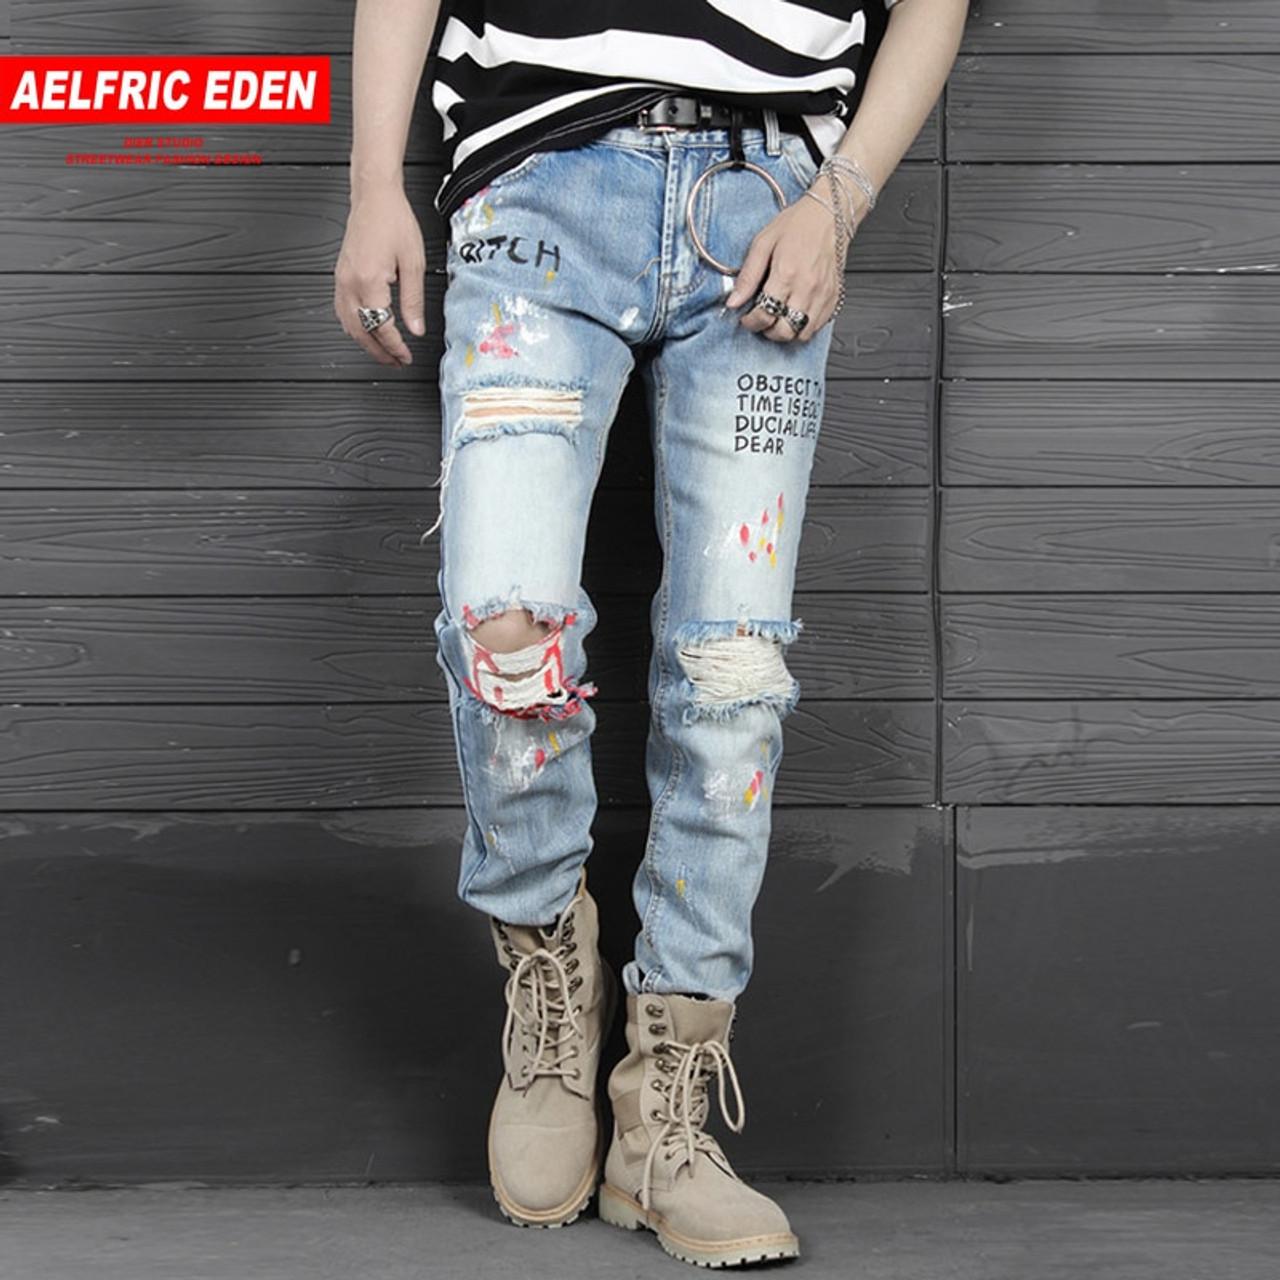 c284189e ... Aelfric Eden Mens Biker Jeans Fashion Casual Pants Graffiti Ripped Hole  2018 Distressed Slim Denim Jean ...